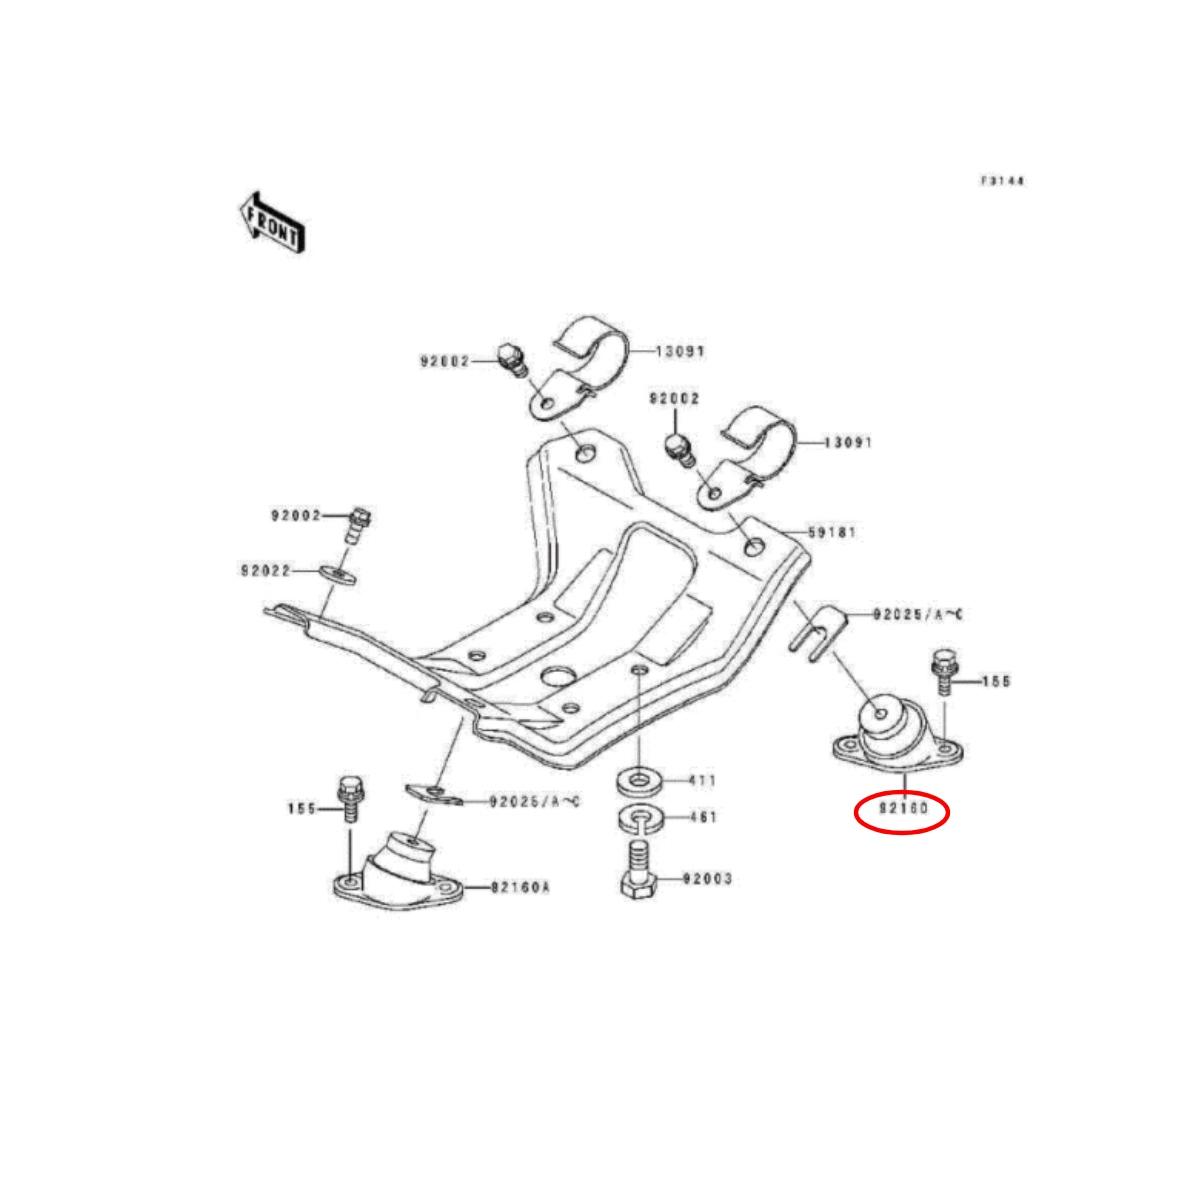 Coxim do Motor para Jet Ski Kawasaki 650cc / 750cc / 800cc  - Radical Peças - Peças para Jet Ski